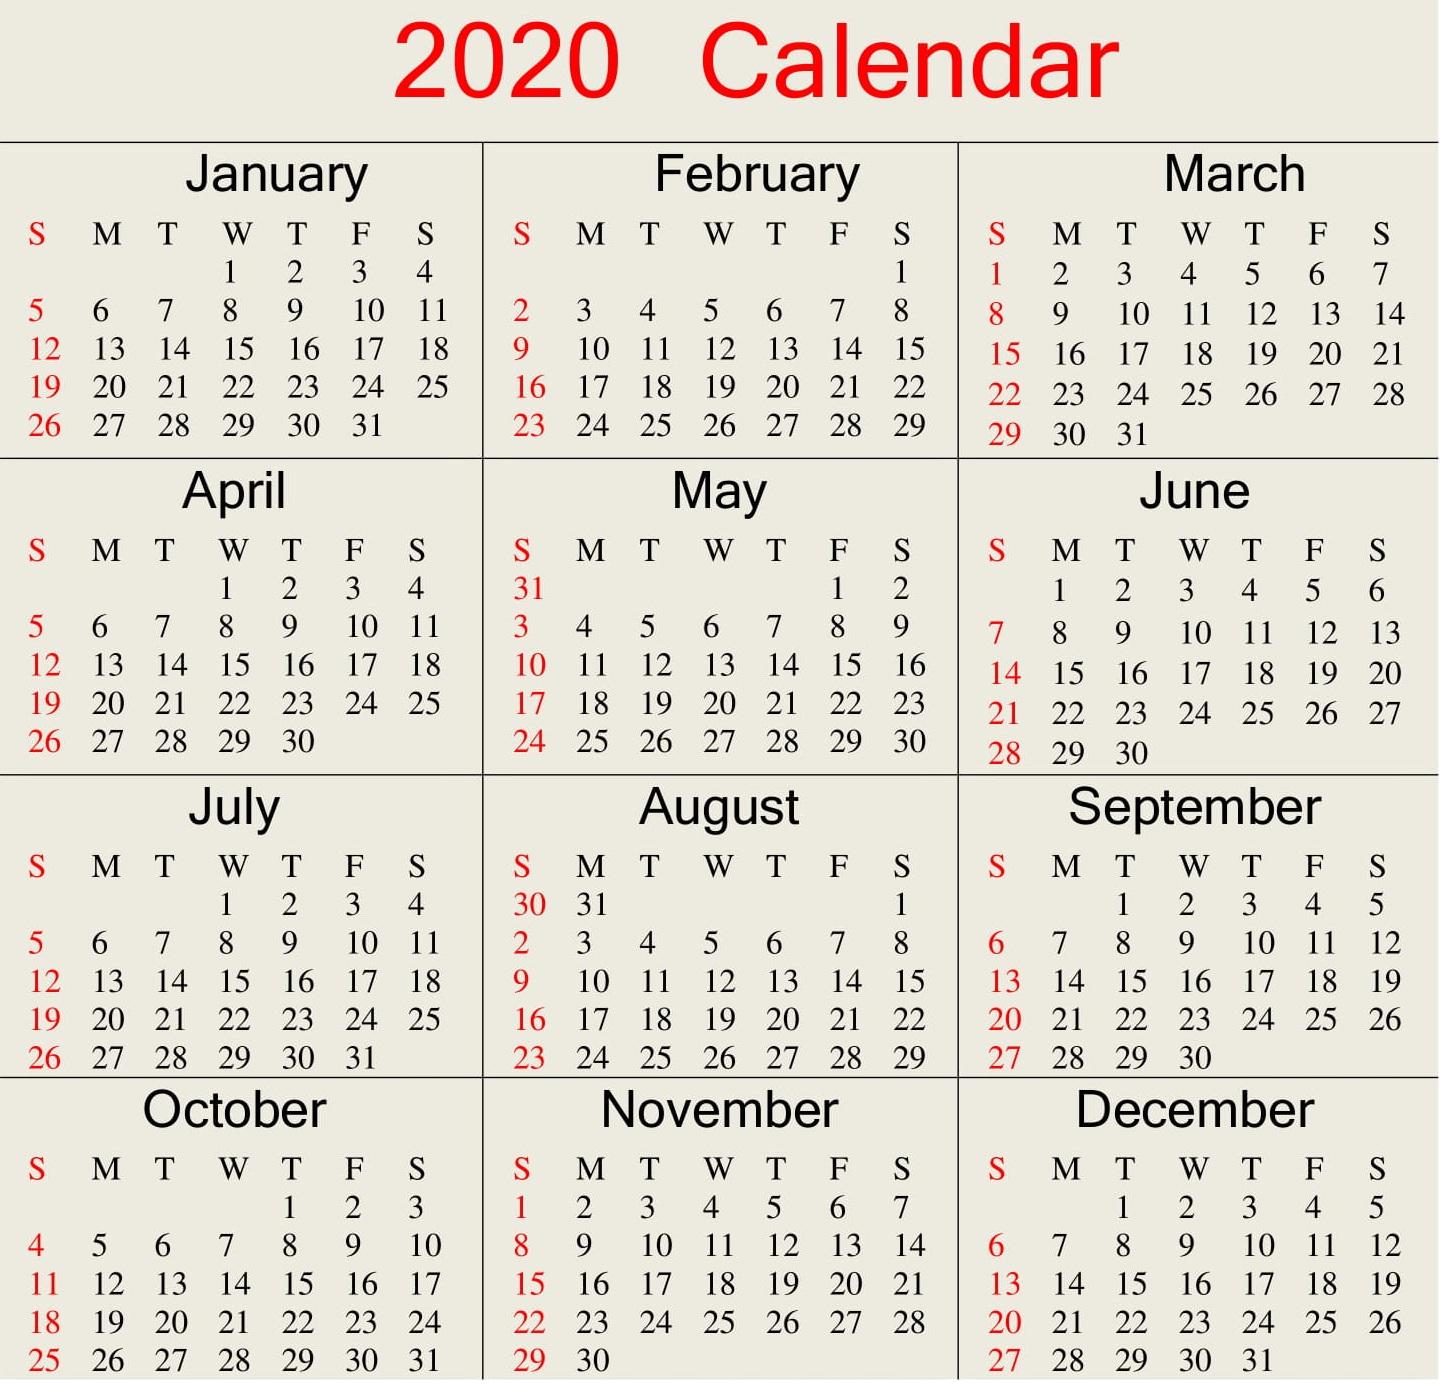 Printable 2020 Calendar Word Document  Latest Printable for Julian Date Calendar For 2020